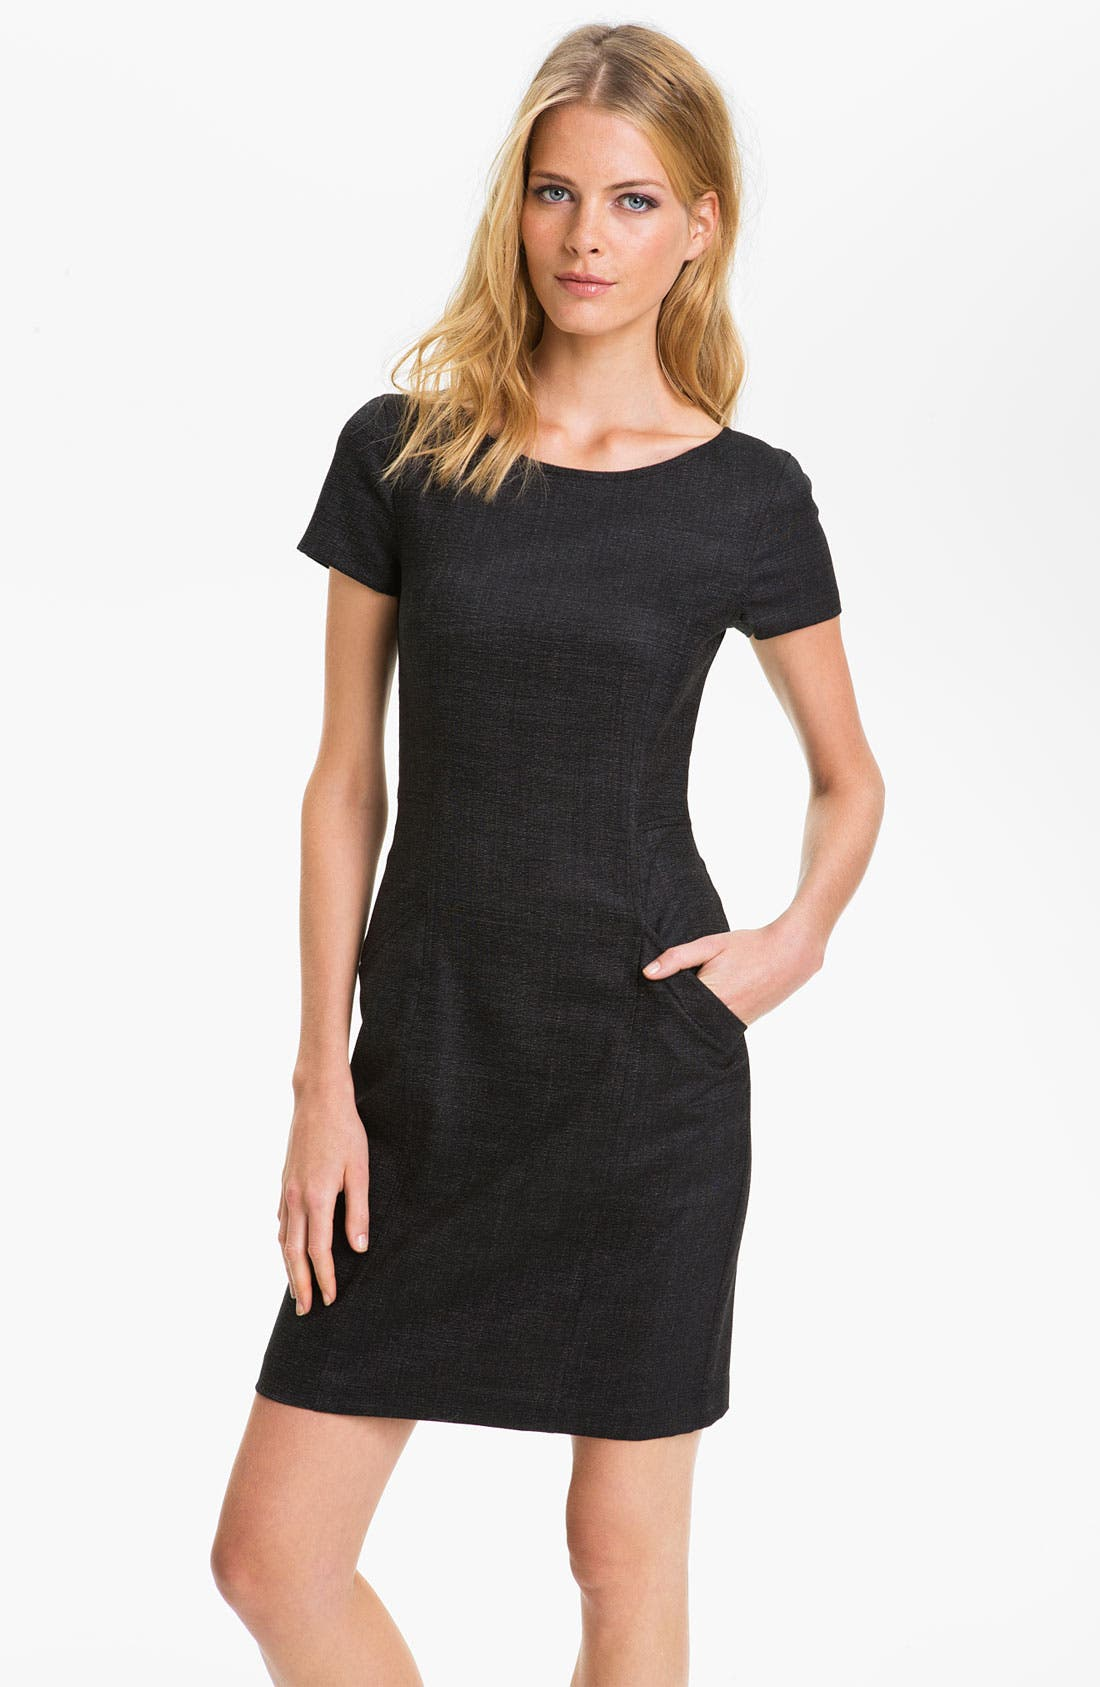 Alternate Image 1 Selected - Theory 'Nuriana' Sheath Dress